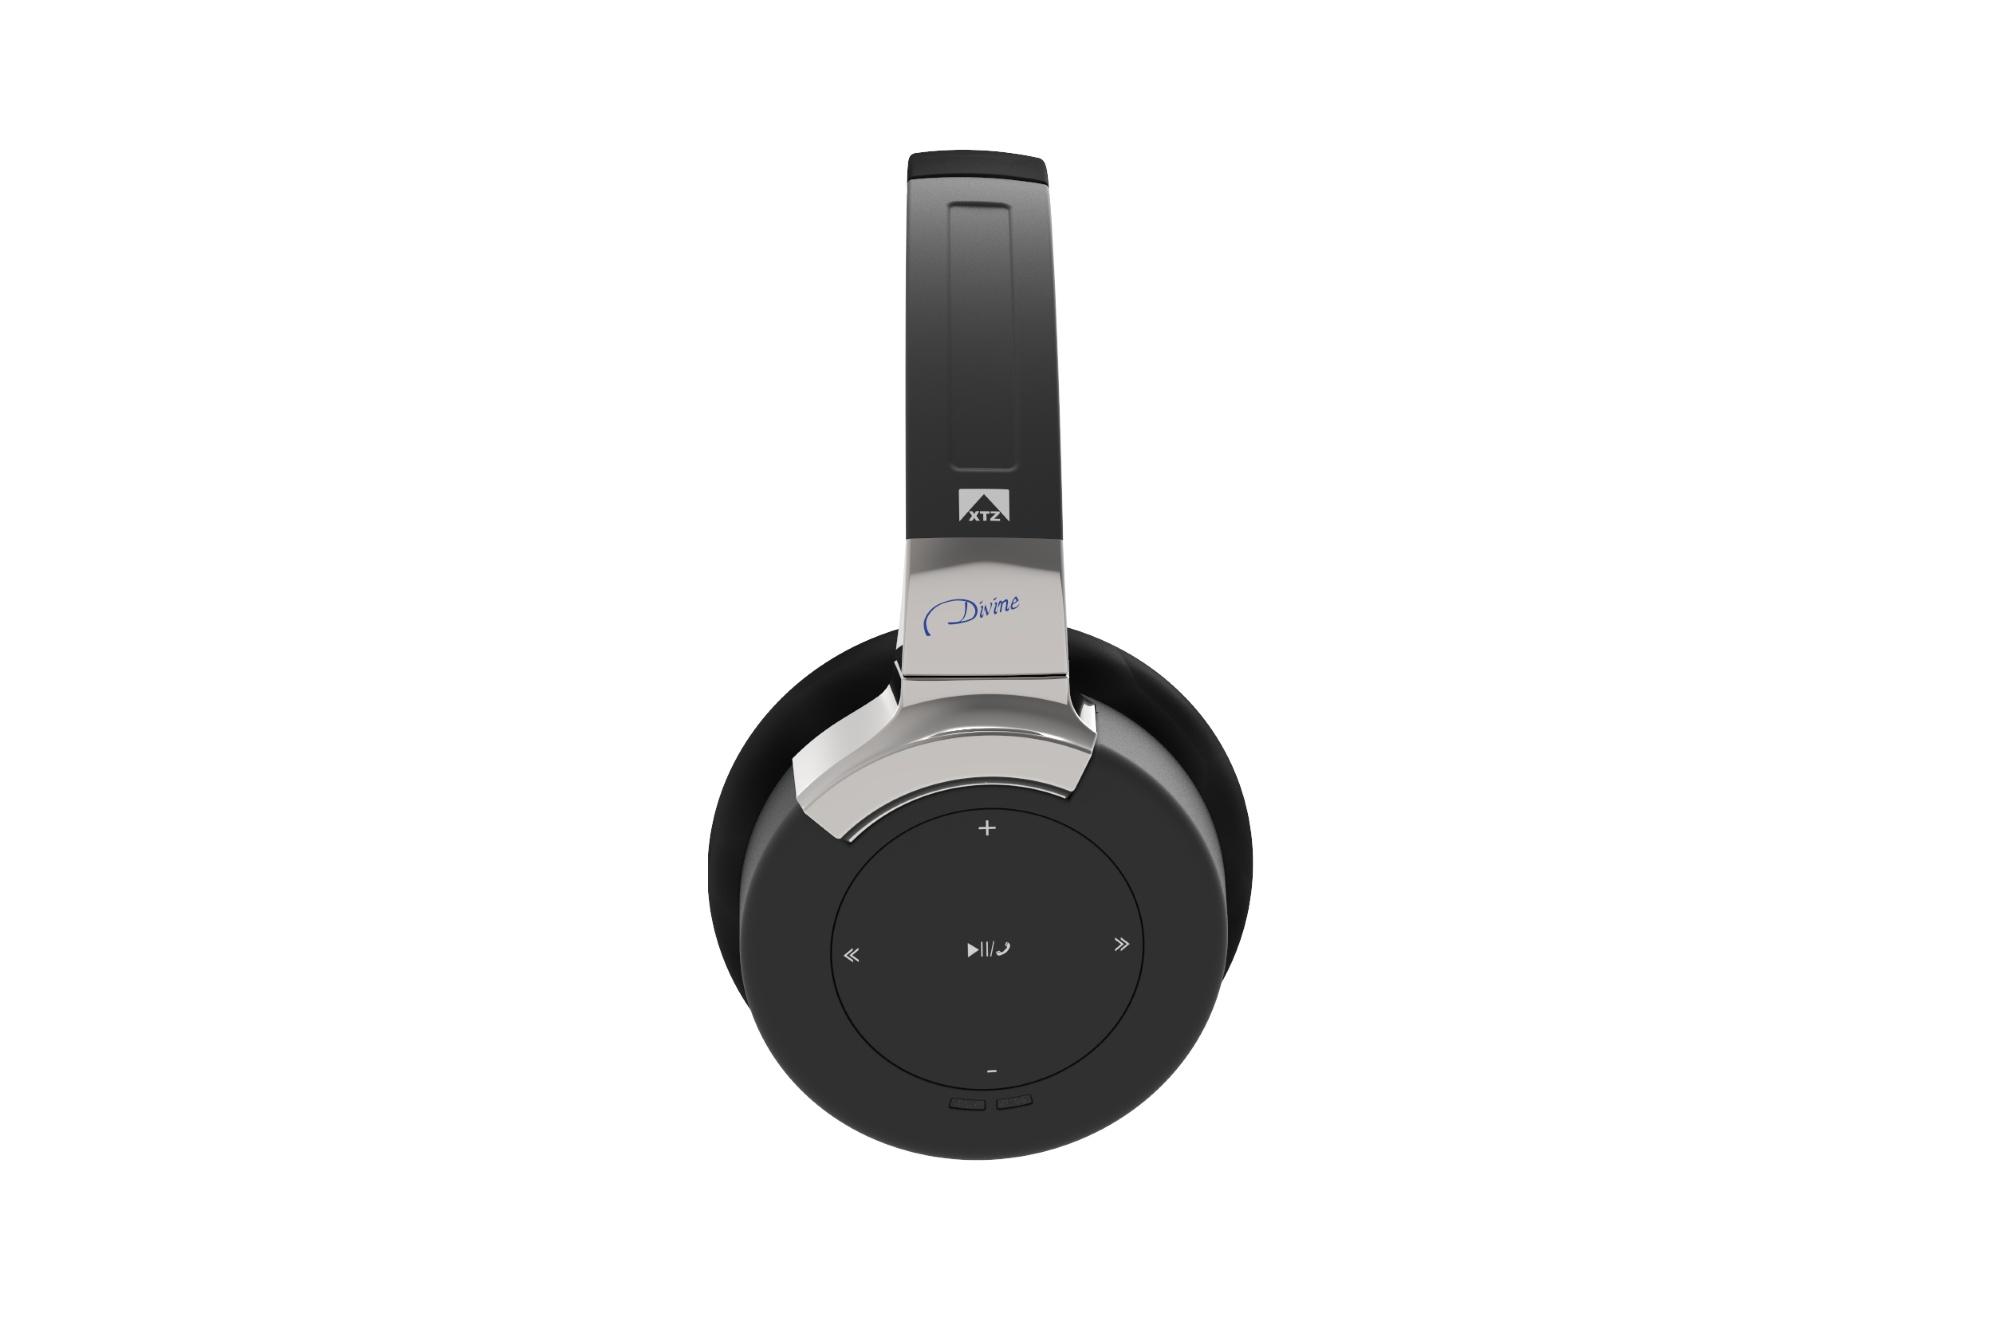 Auriculares wireless Xtz_headphone_divine_dsp_on-ear_mic3_black-33221947-xtra5